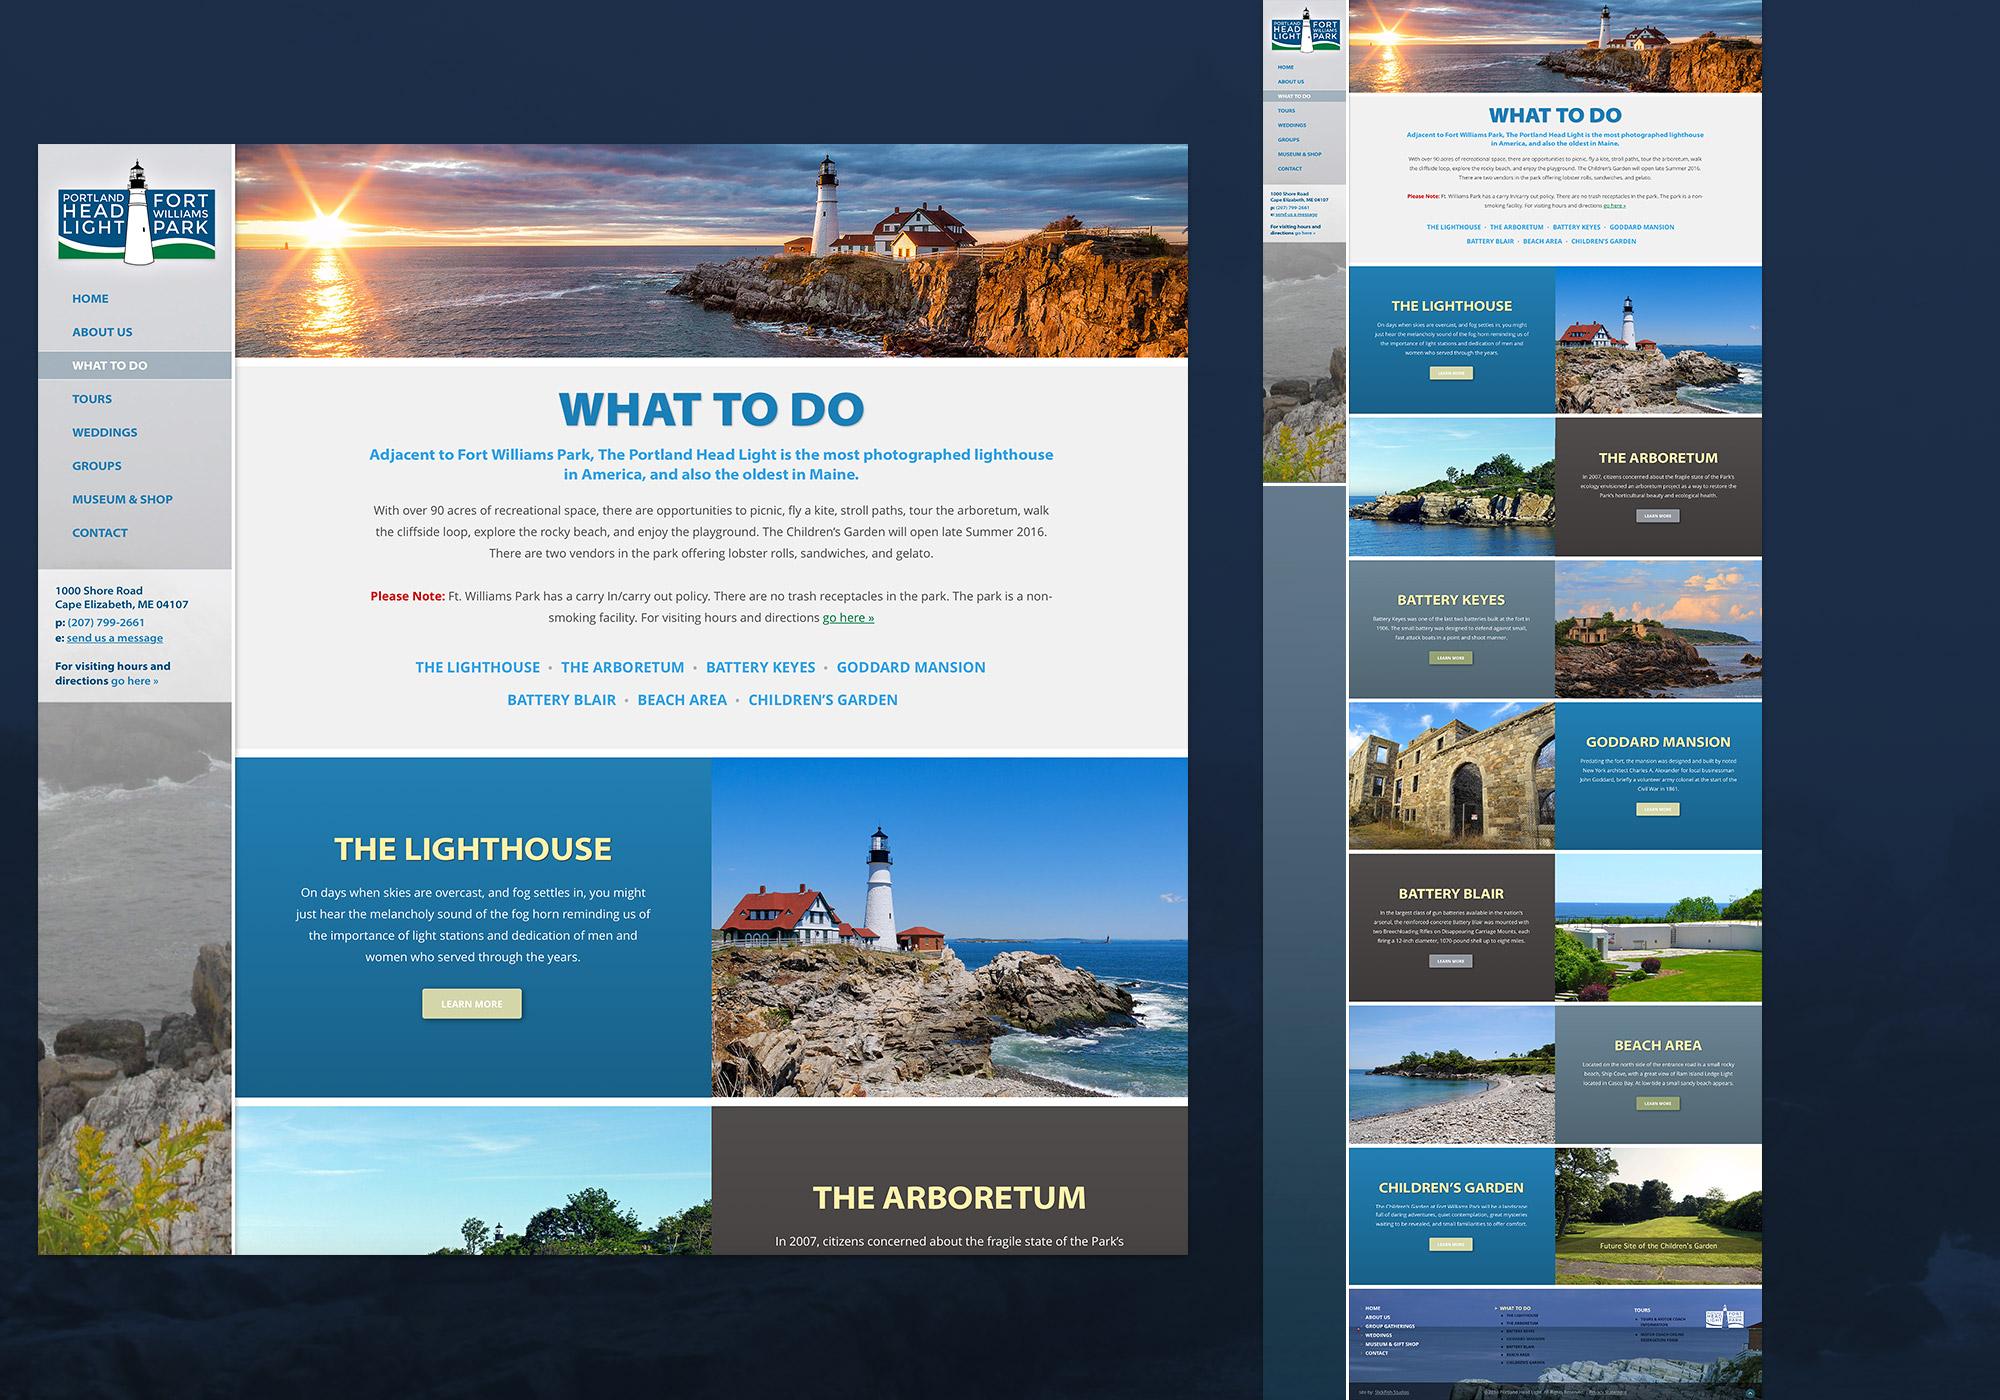 A screenshot of the SlickFish designed Fort Williams Park web site in Cape Elizabeth, Maine.